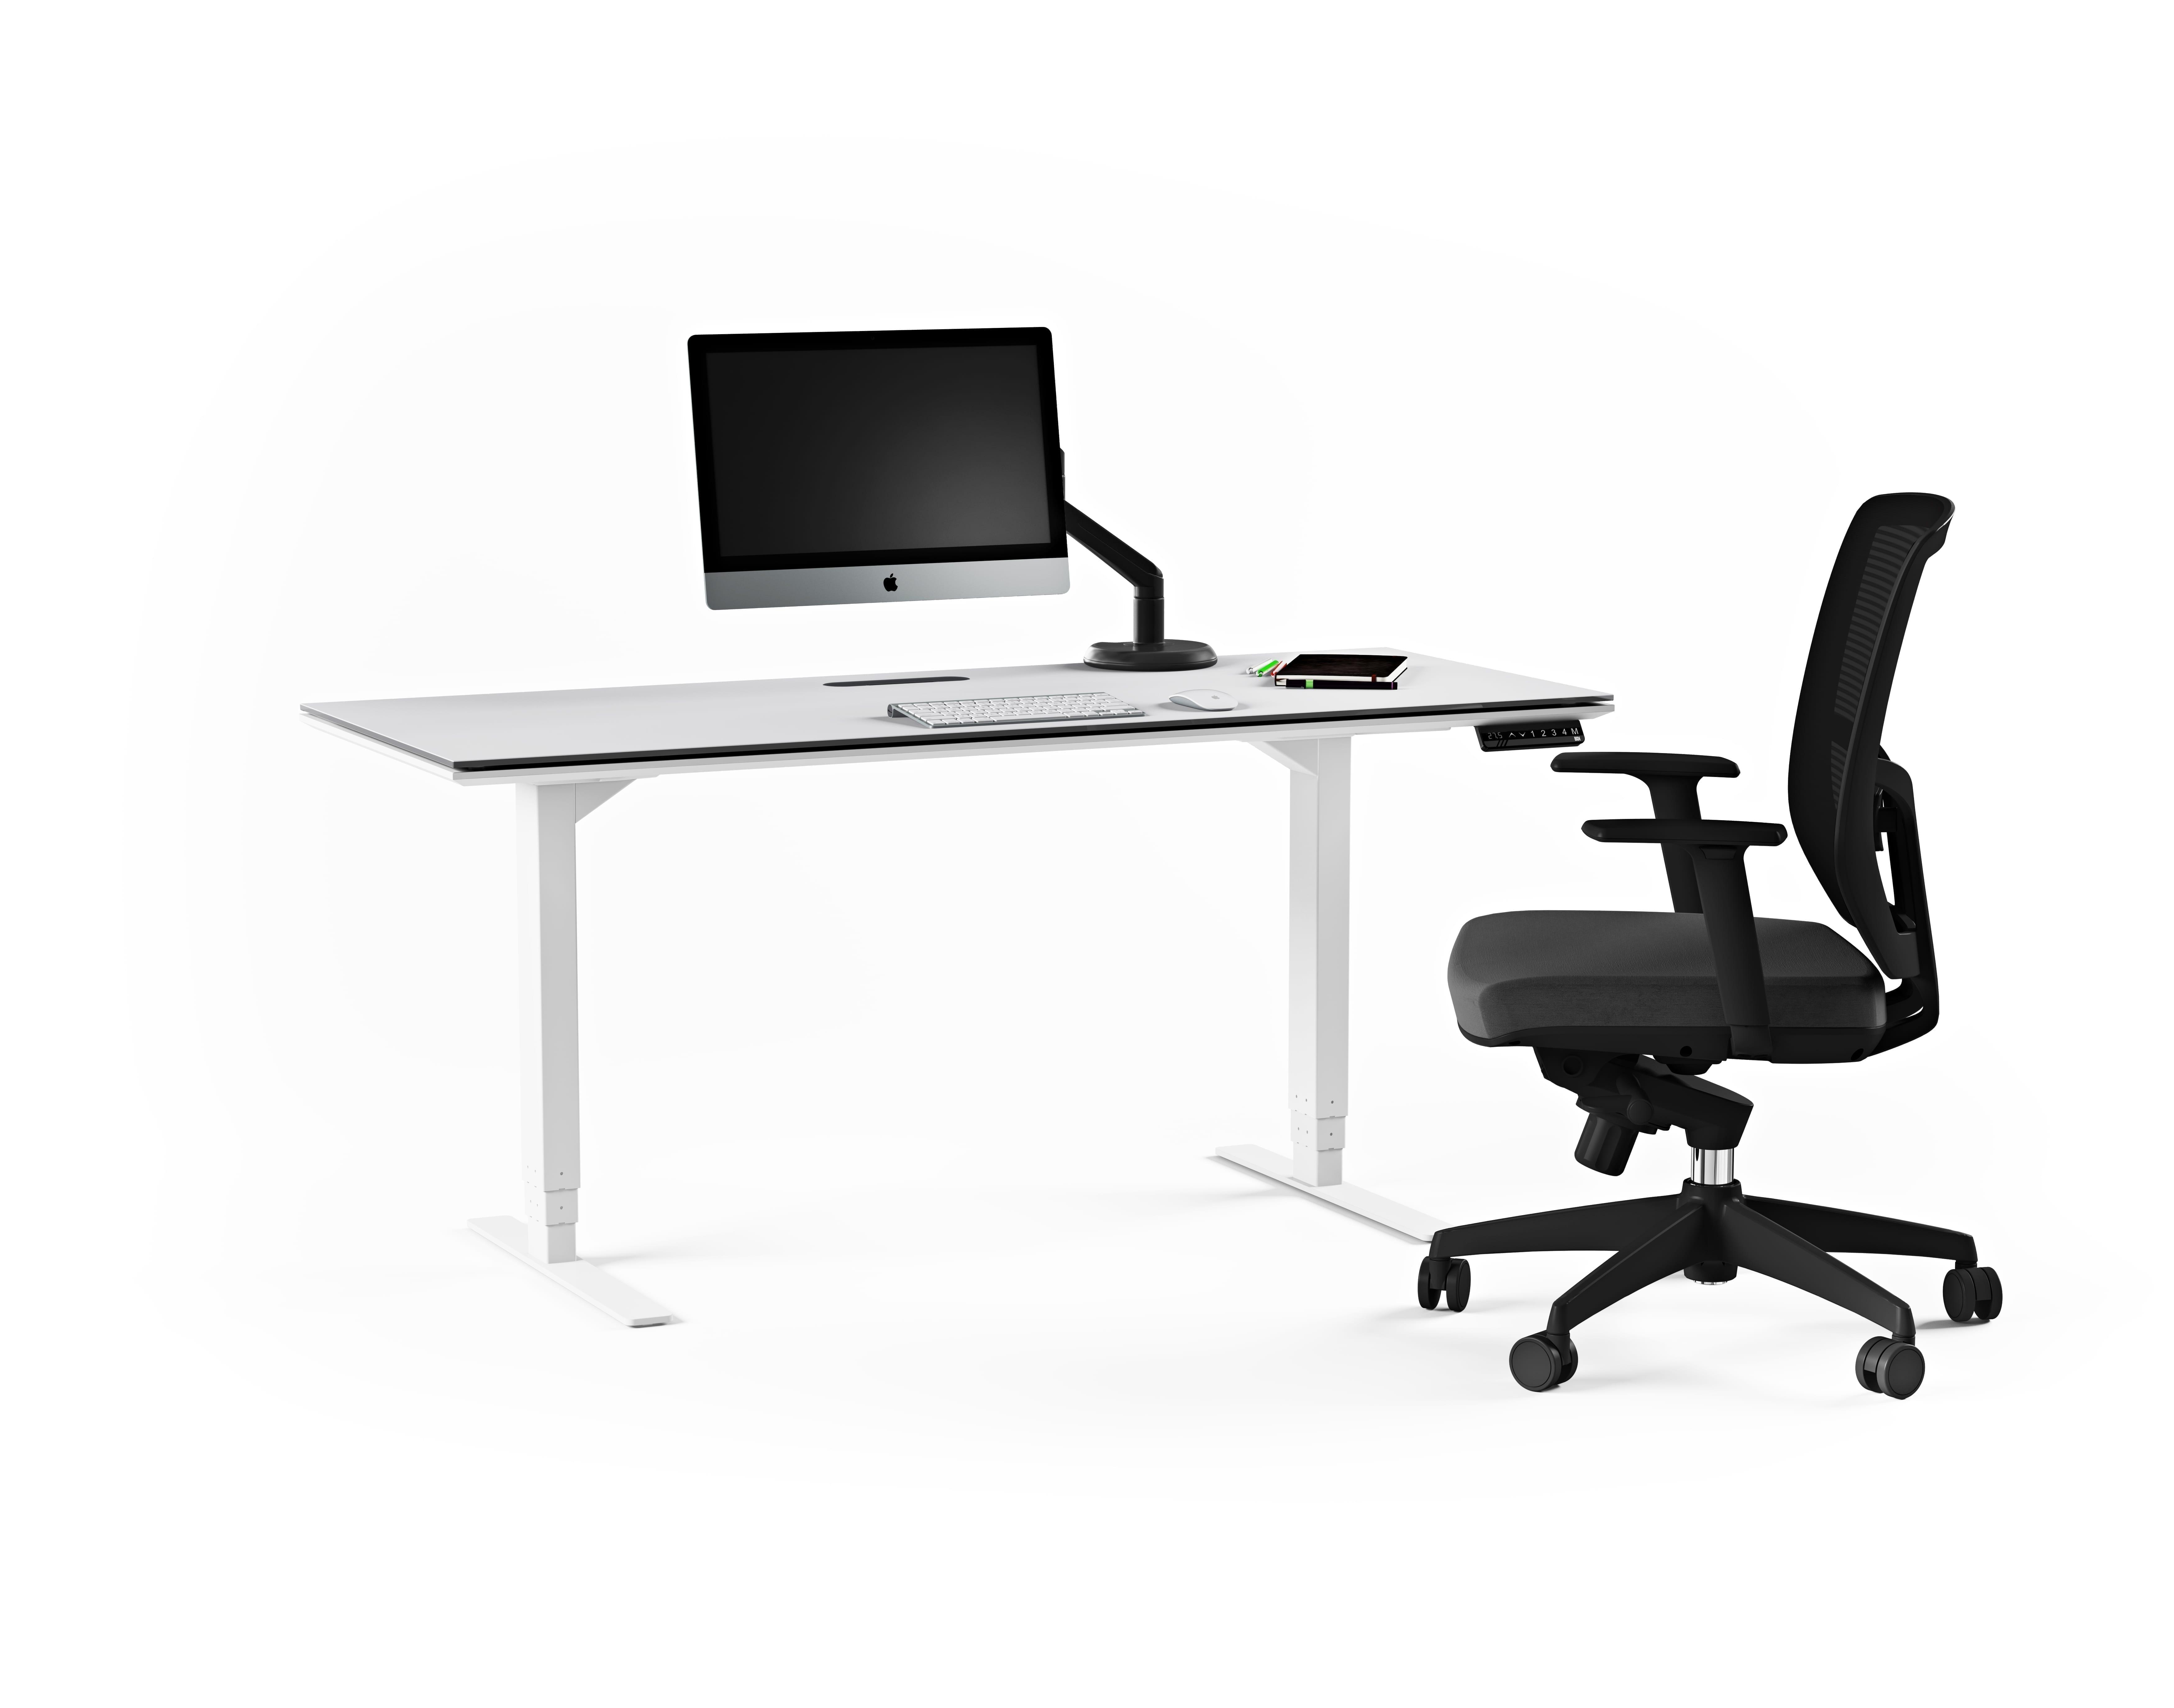 Centro 6452 Office Standing Desk White 4